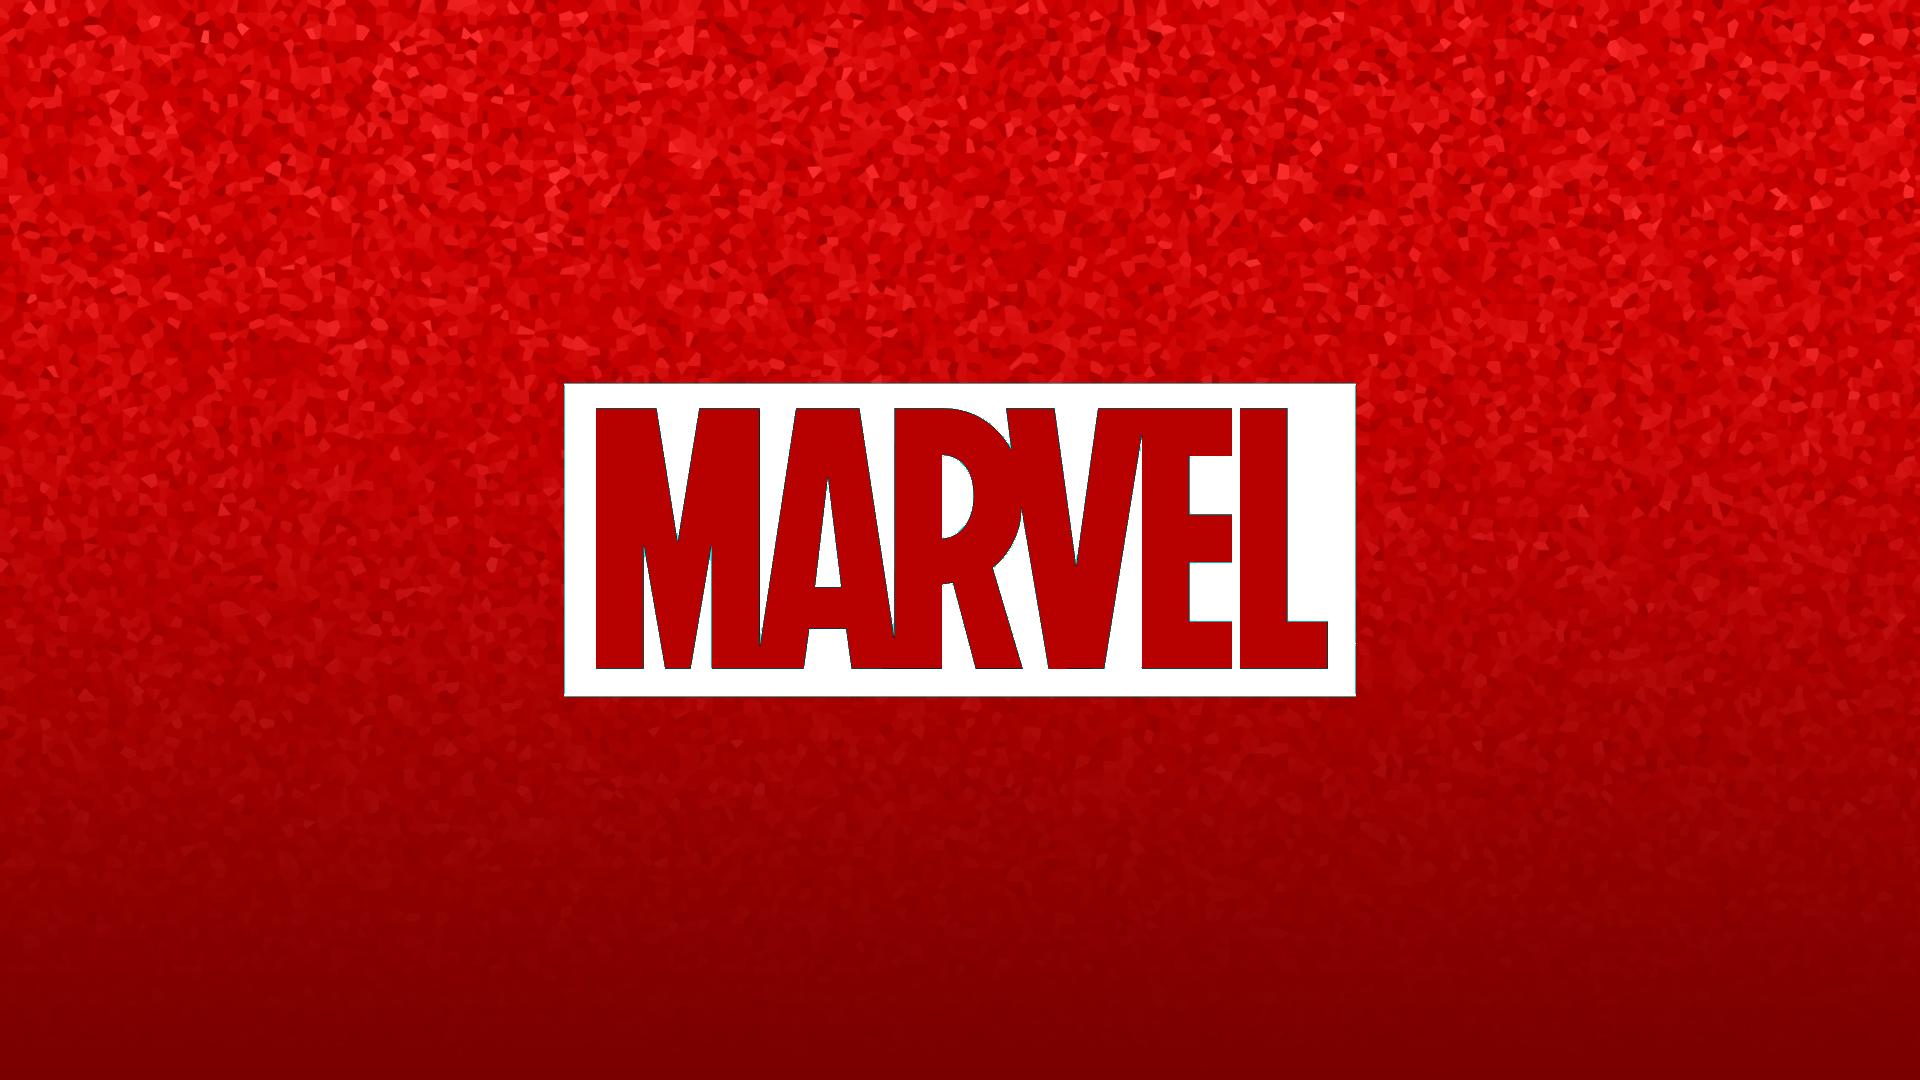 marvel logo wallpaper 1920x1080 - photo #10